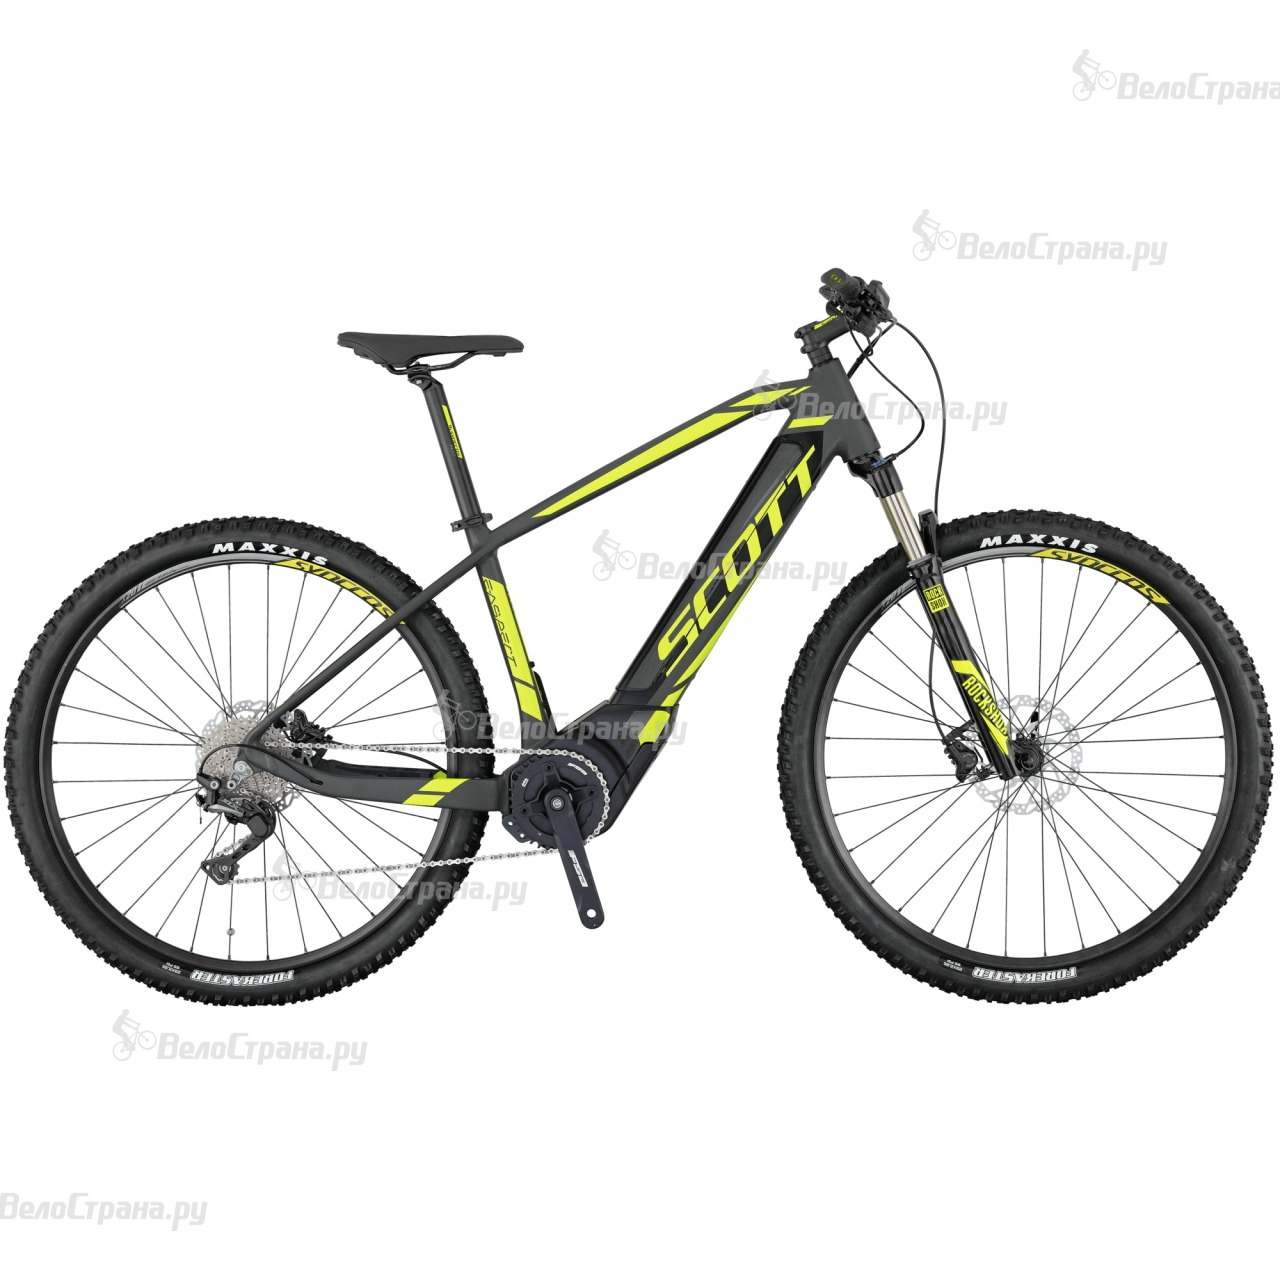 Велосипед Scott E-Aspect 920 (2017) велосипед scott aspect 920 29 2016